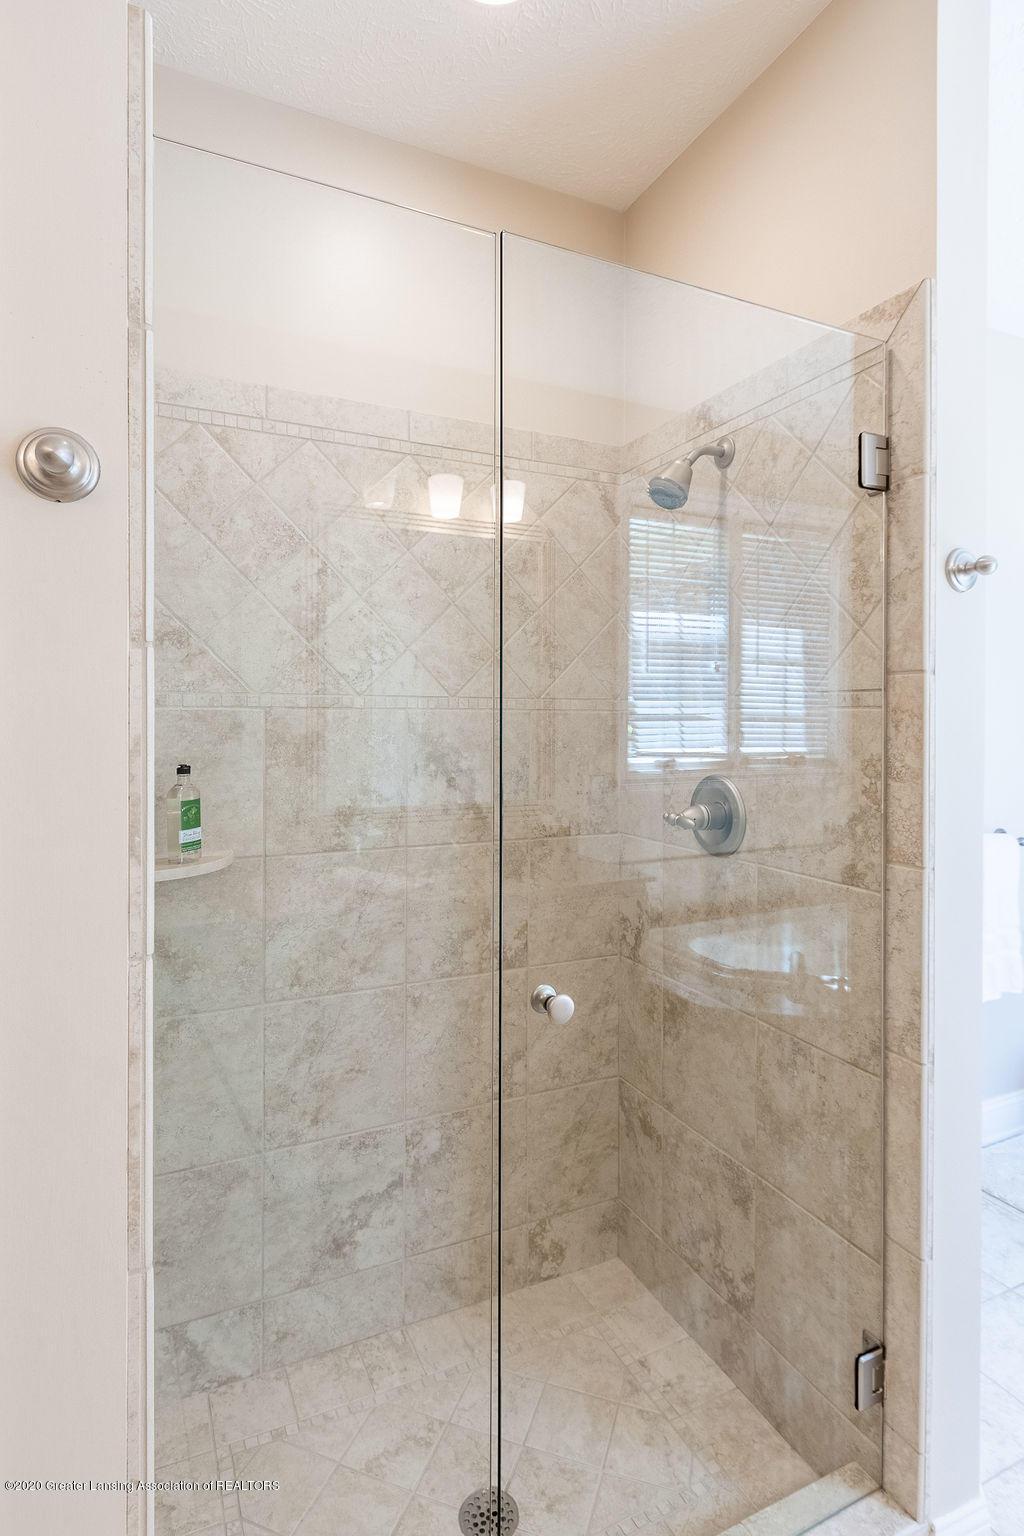 6198 Graebear Trail 56 - Large tiled shower - 30